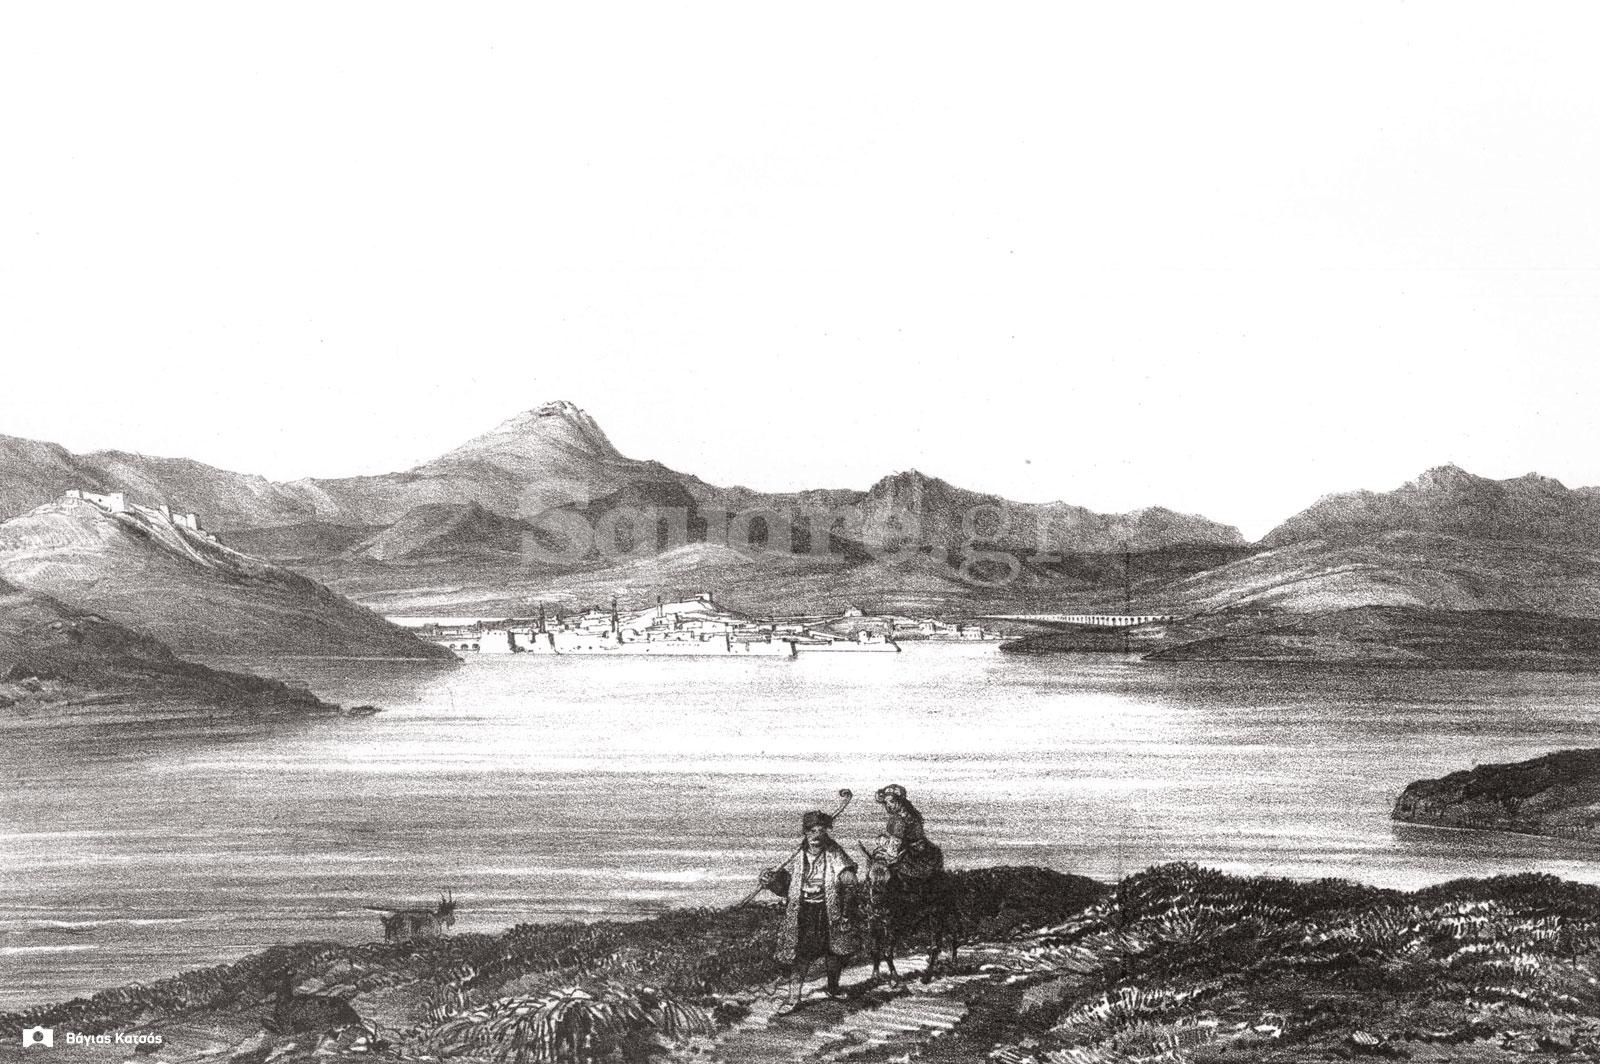 5-Otto-Magnus-von-Stackelberg,-La-Grece,-Vues-pittoresques-et-topographiques,,,-1829-1834